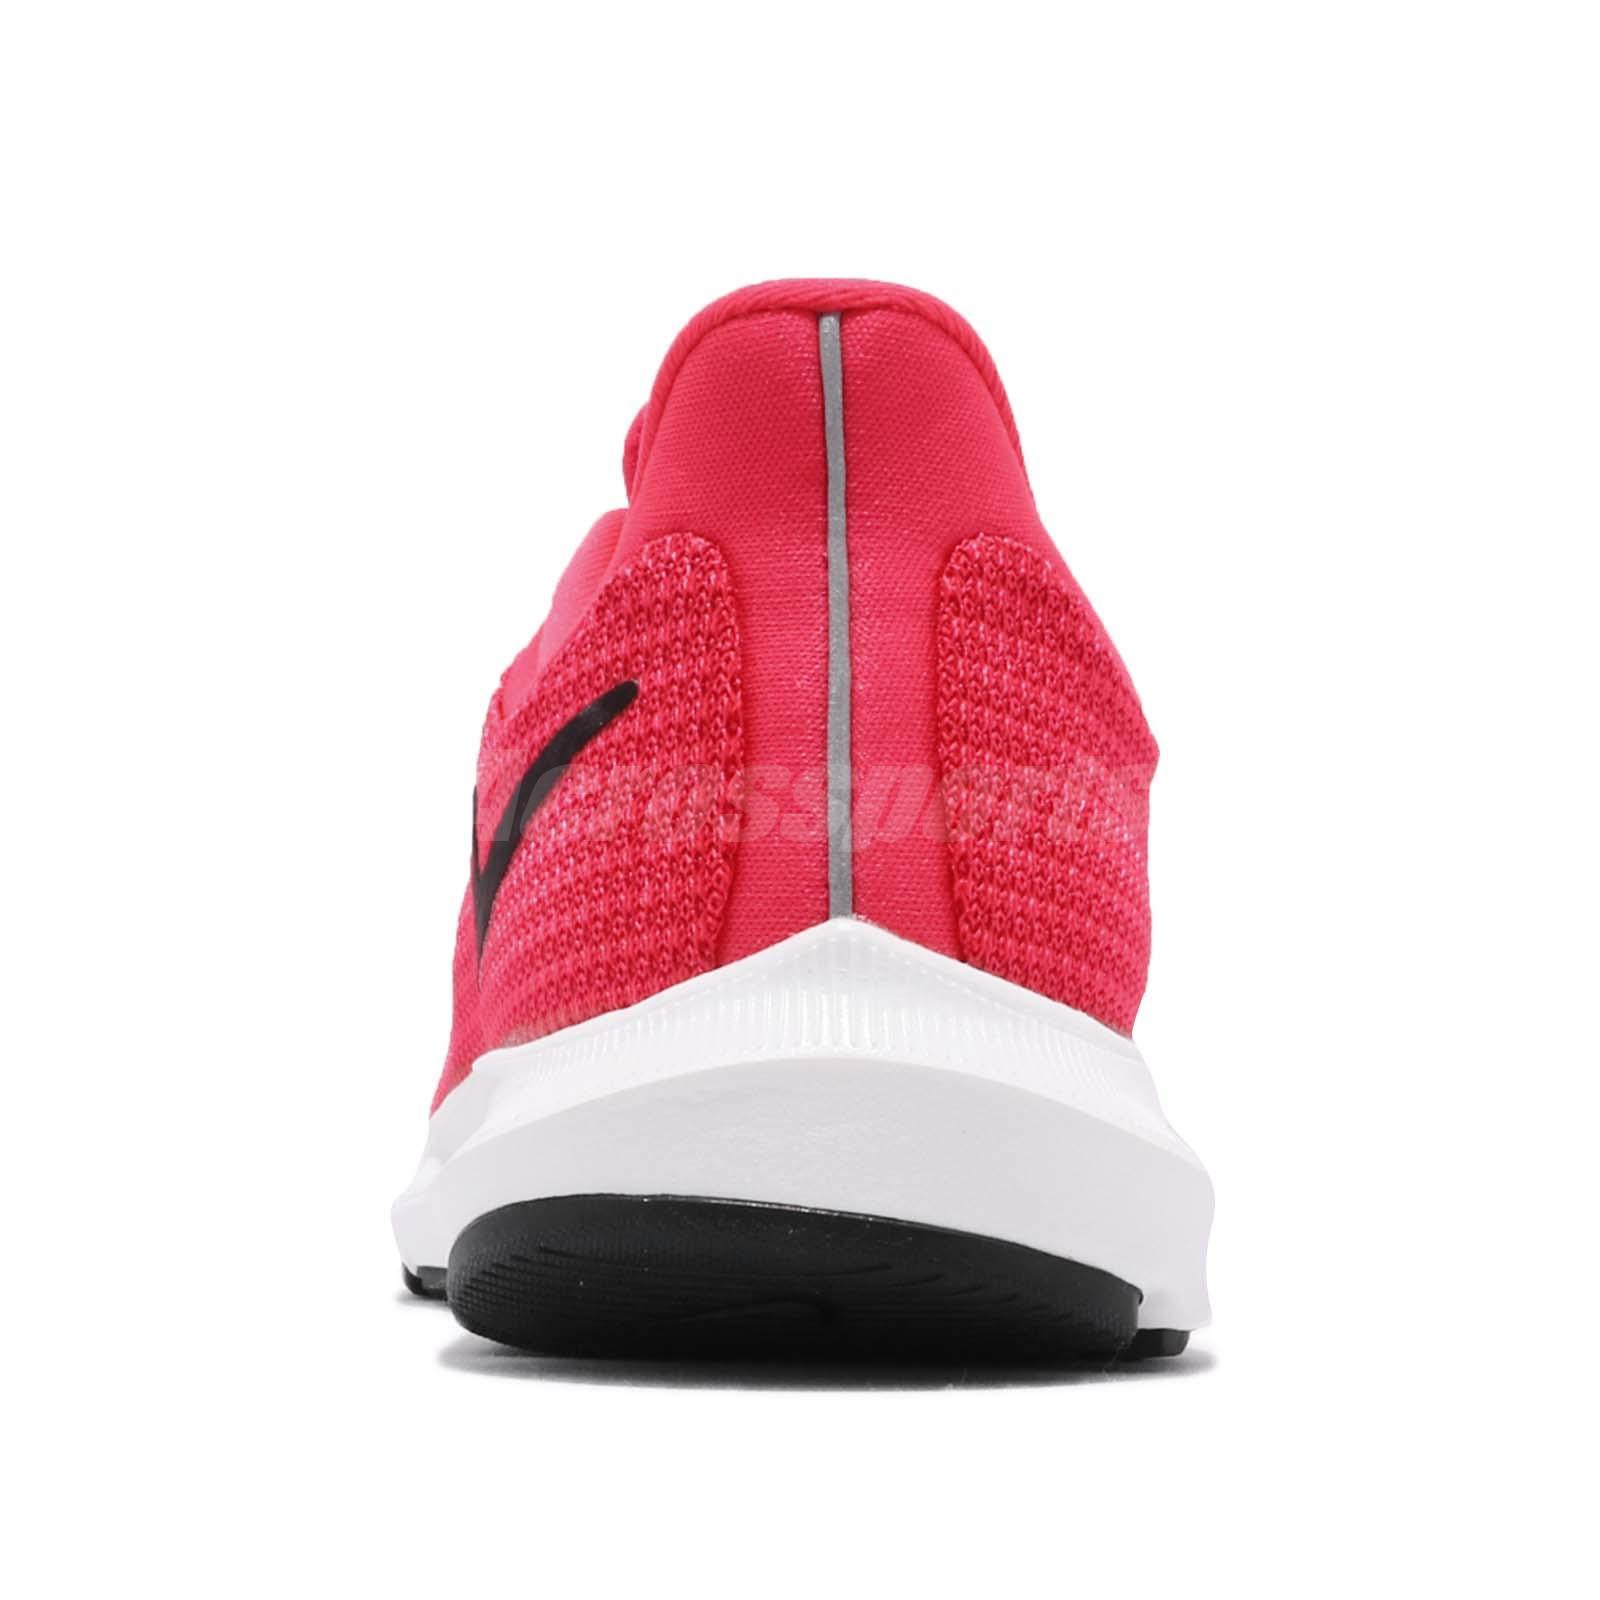 993e7c4b91cc Nike Wmns Quest Red Orbit Black White Women Running Shoes Sneakers ...